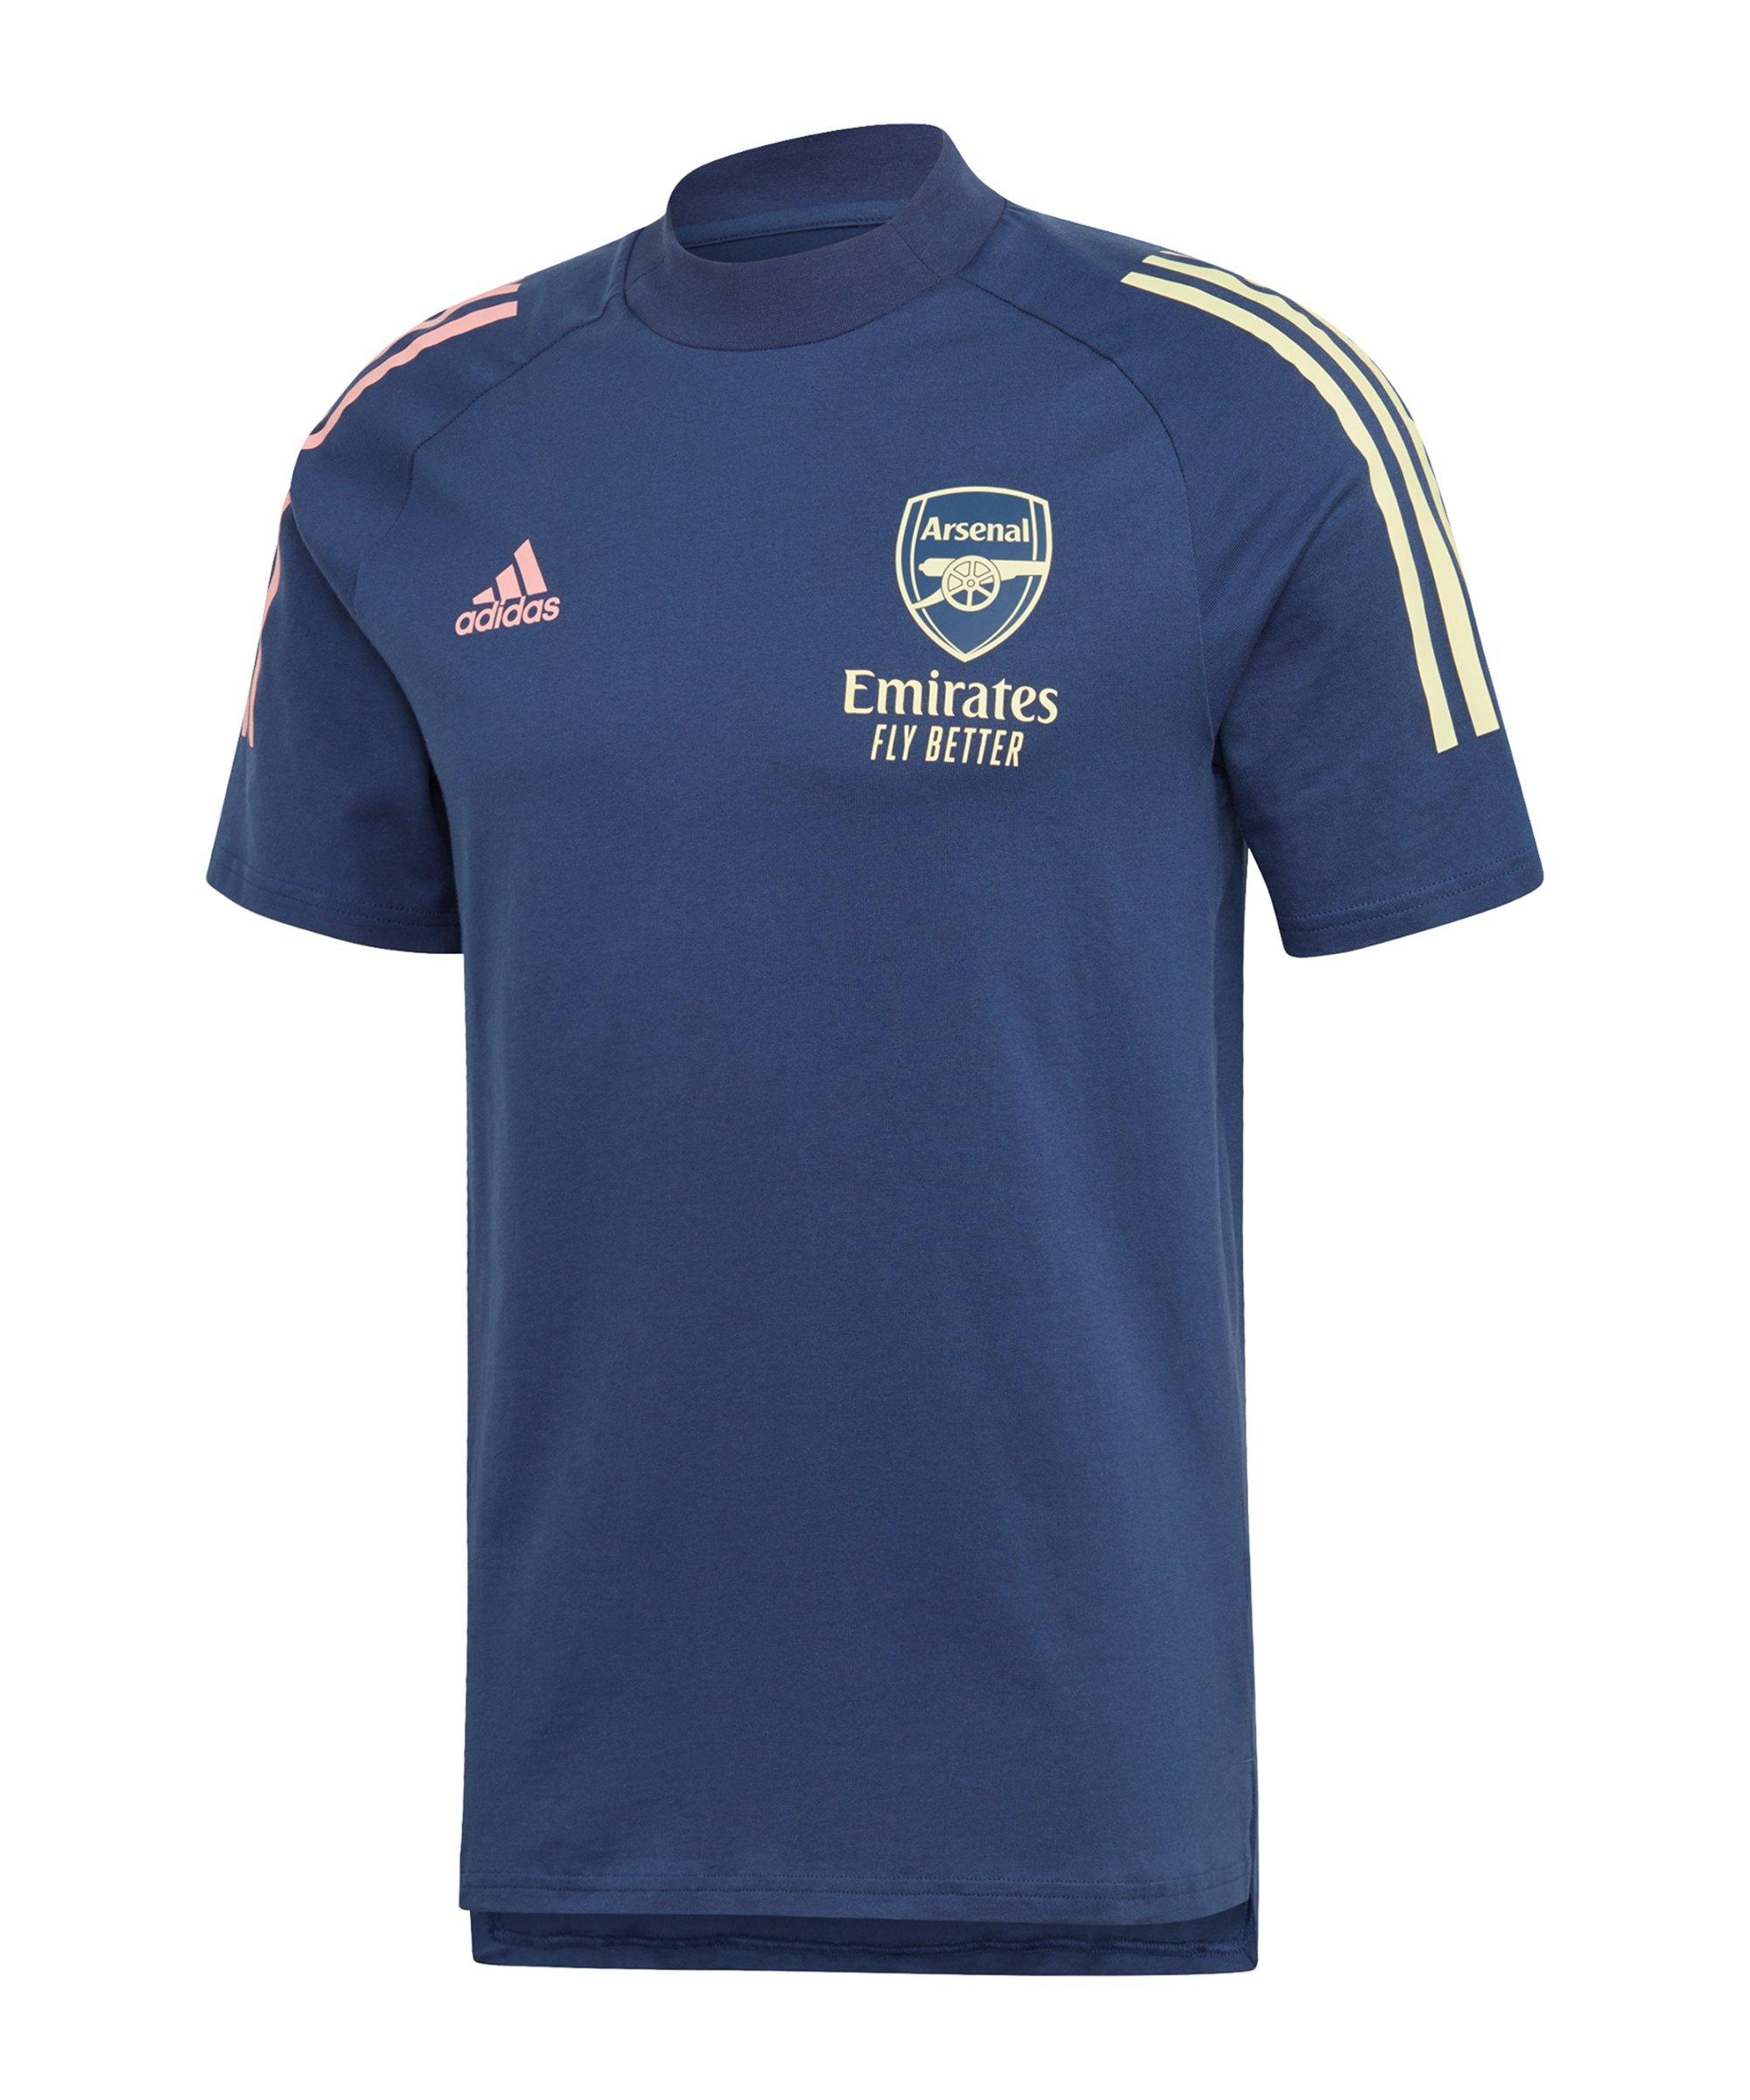 adidas FC Arsenal London T-Shirt Blau - blau